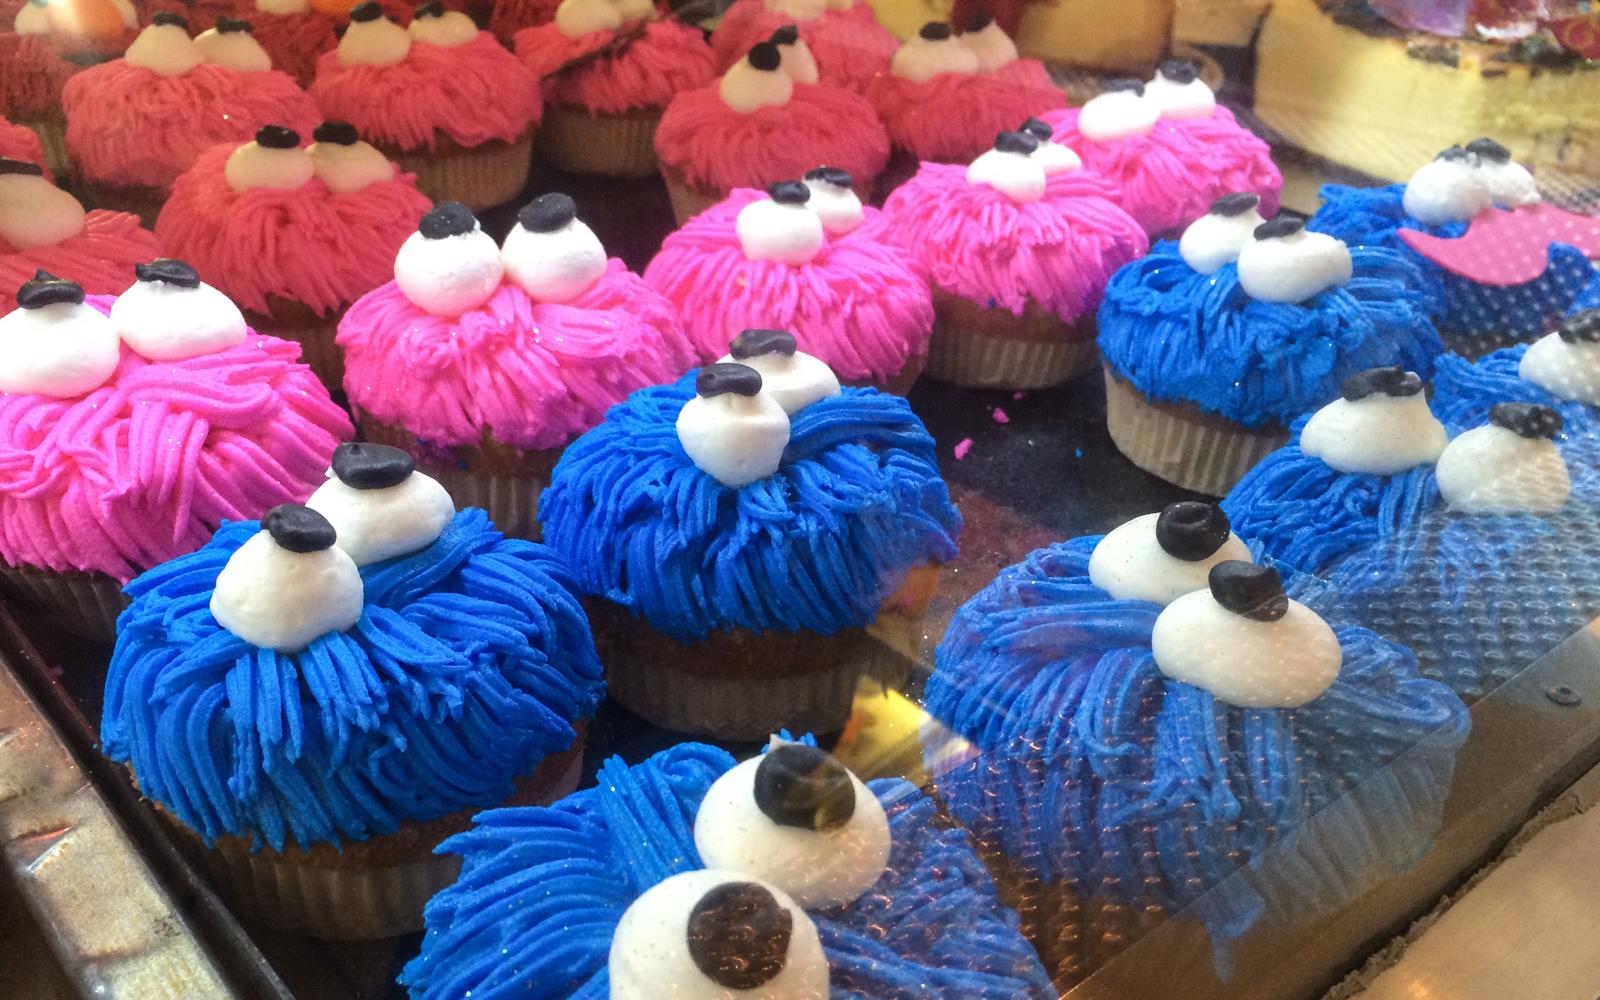 charlys-bakery-cupcake-cookiemonster-1